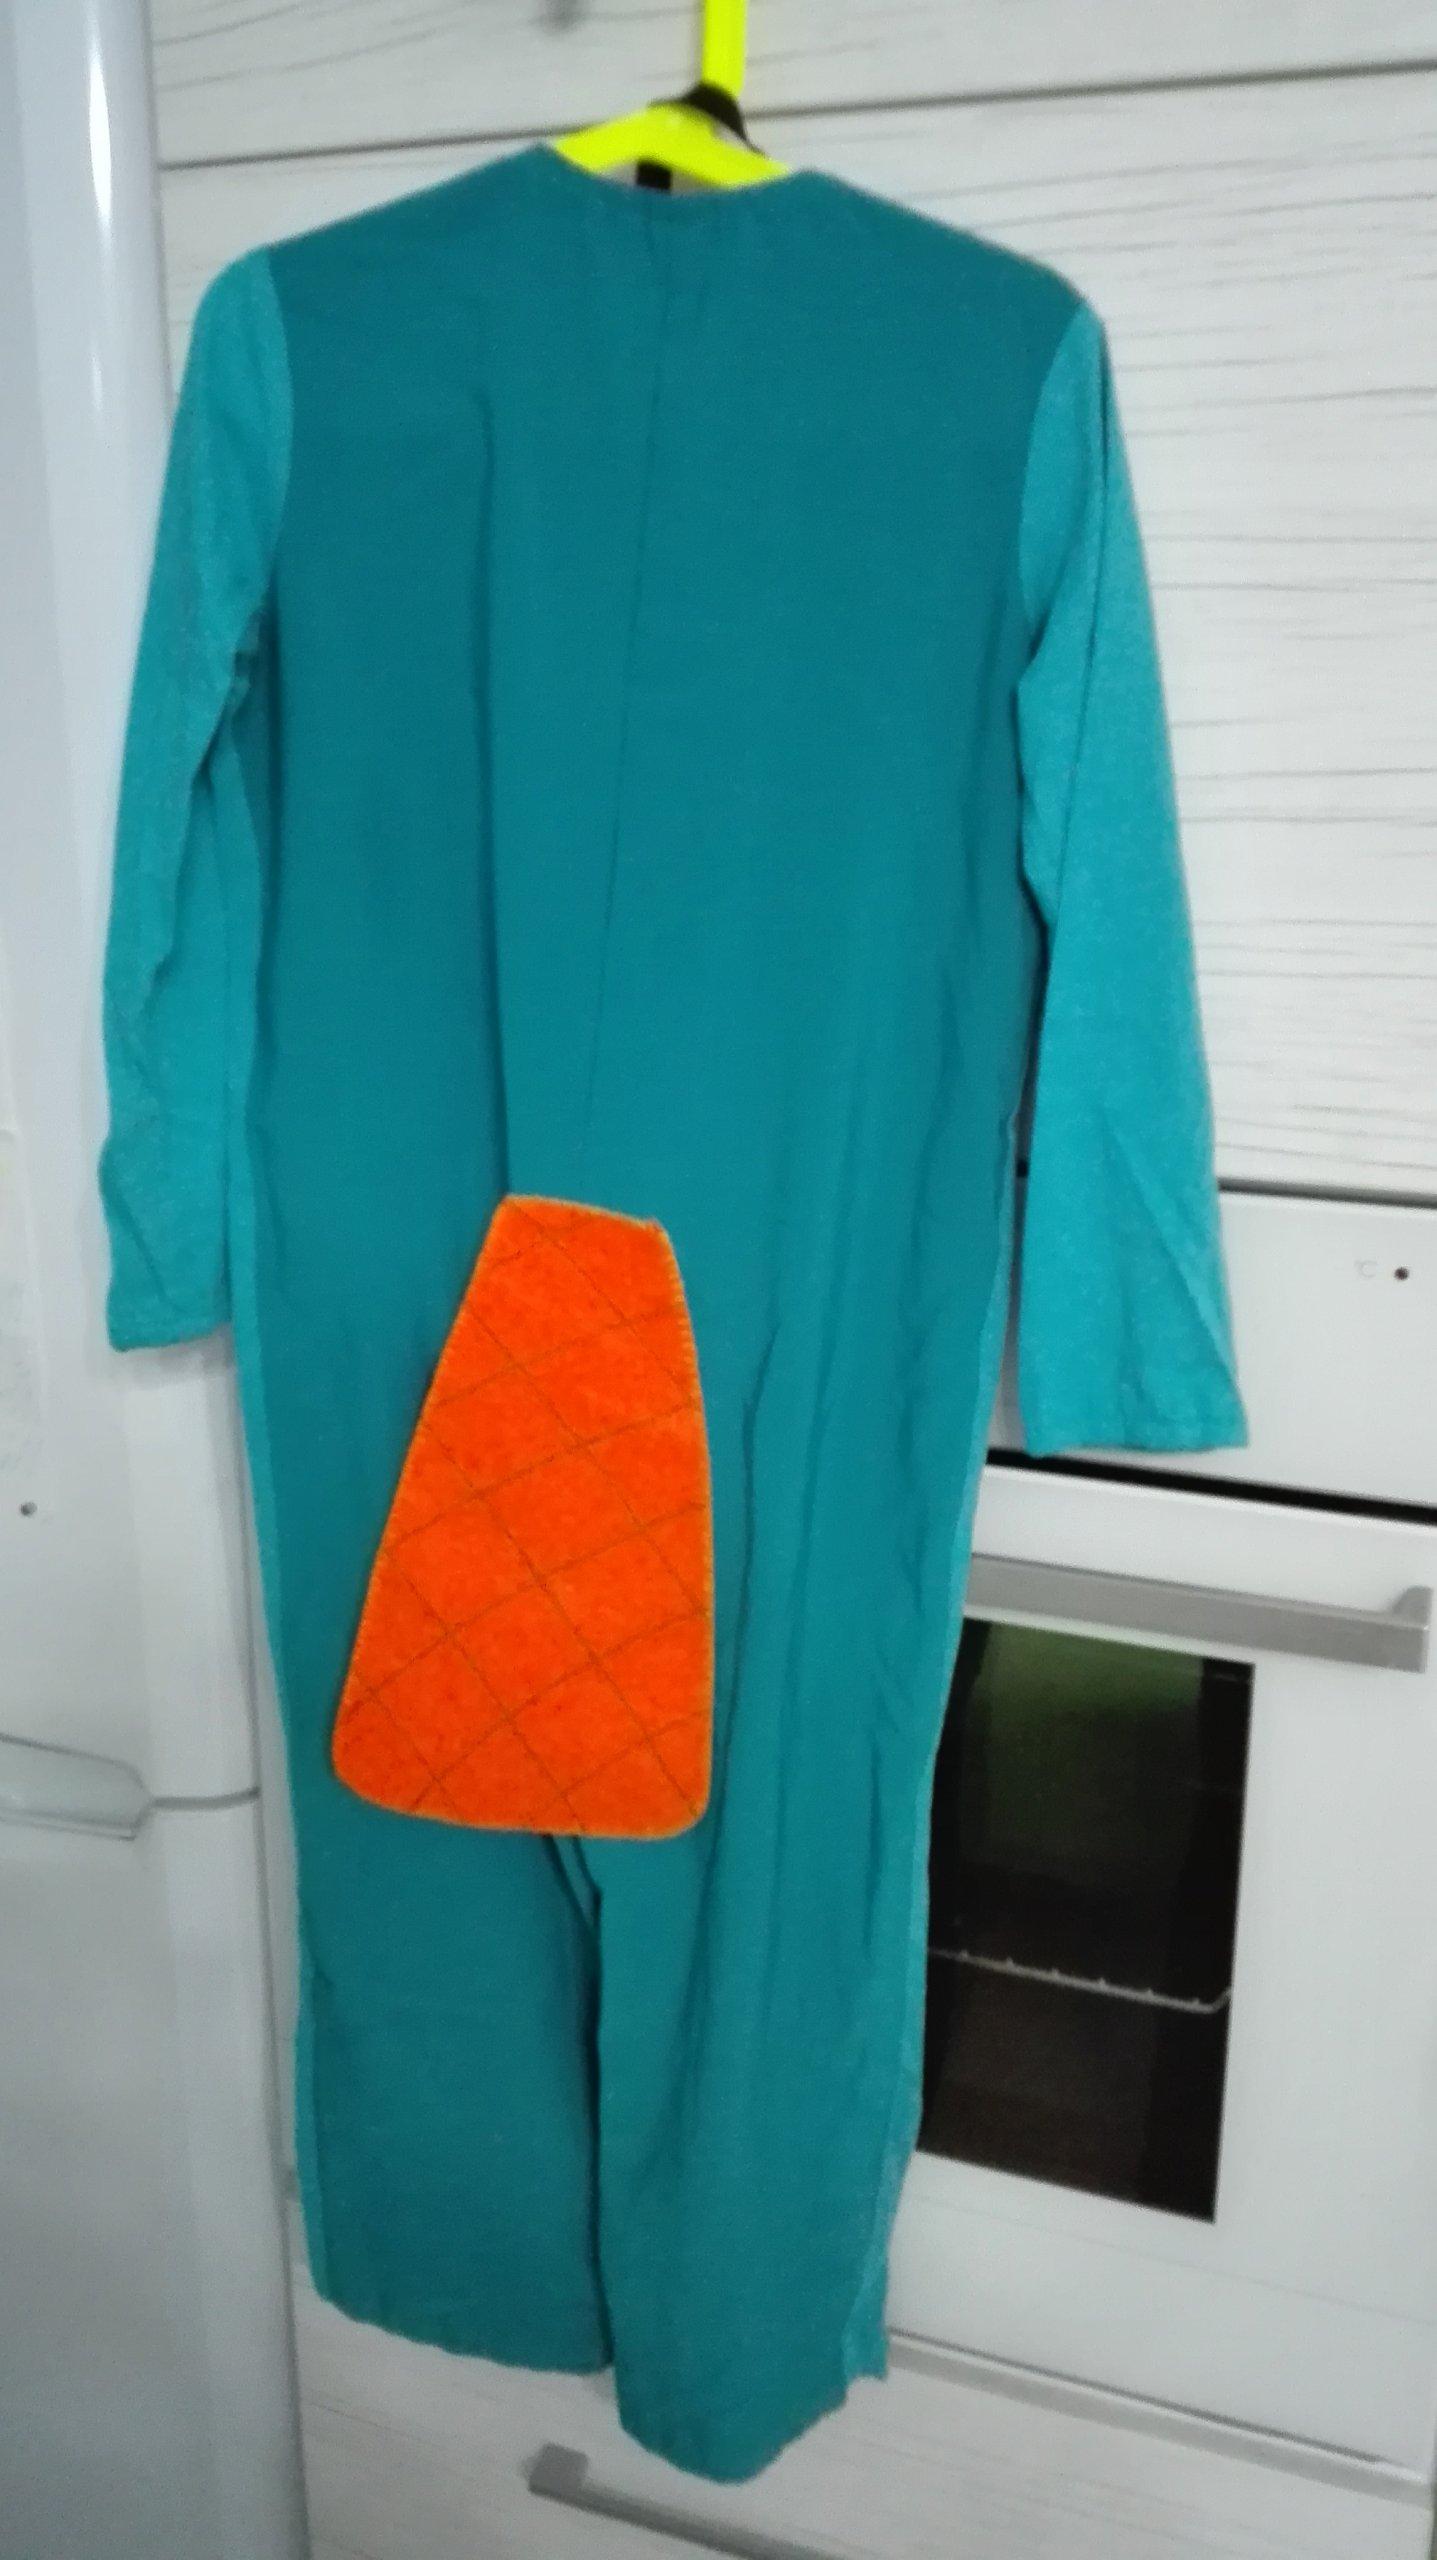 5380aec173 Strój kostium Pepe Pan Dziobak Fineasz i Ferb - 7121988692 ...